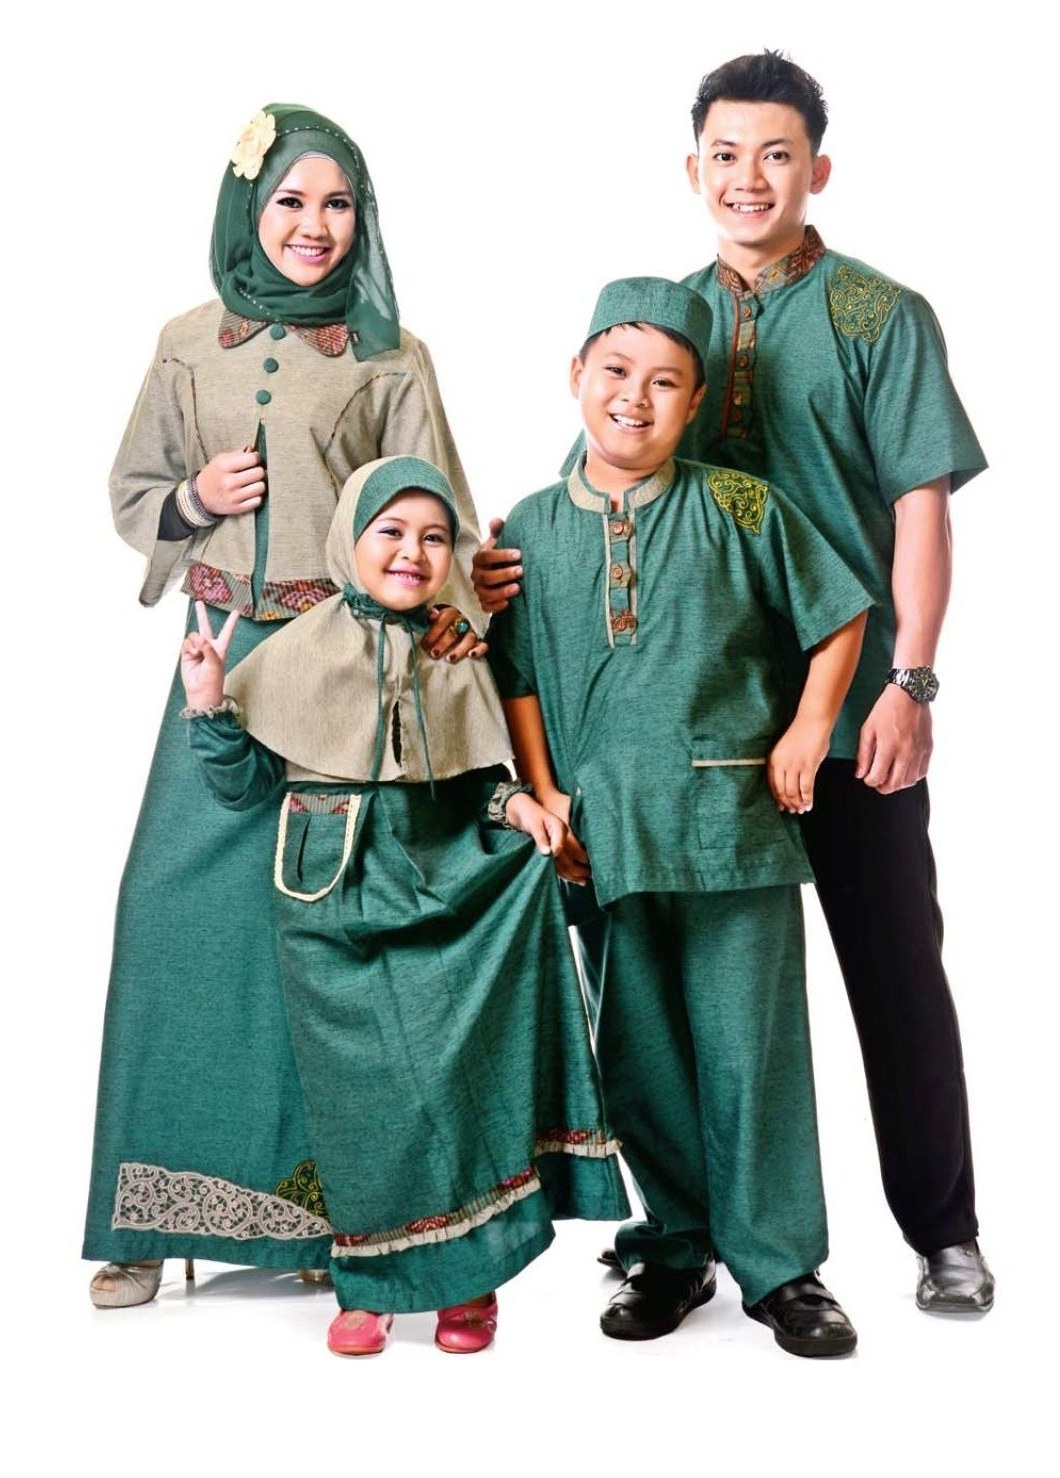 Design Warna Baju Lebaran 2019 Keluarga Dwdk 40 Baju Seragam Keluarga Lebaran 2020 Inspirasi Terbaru